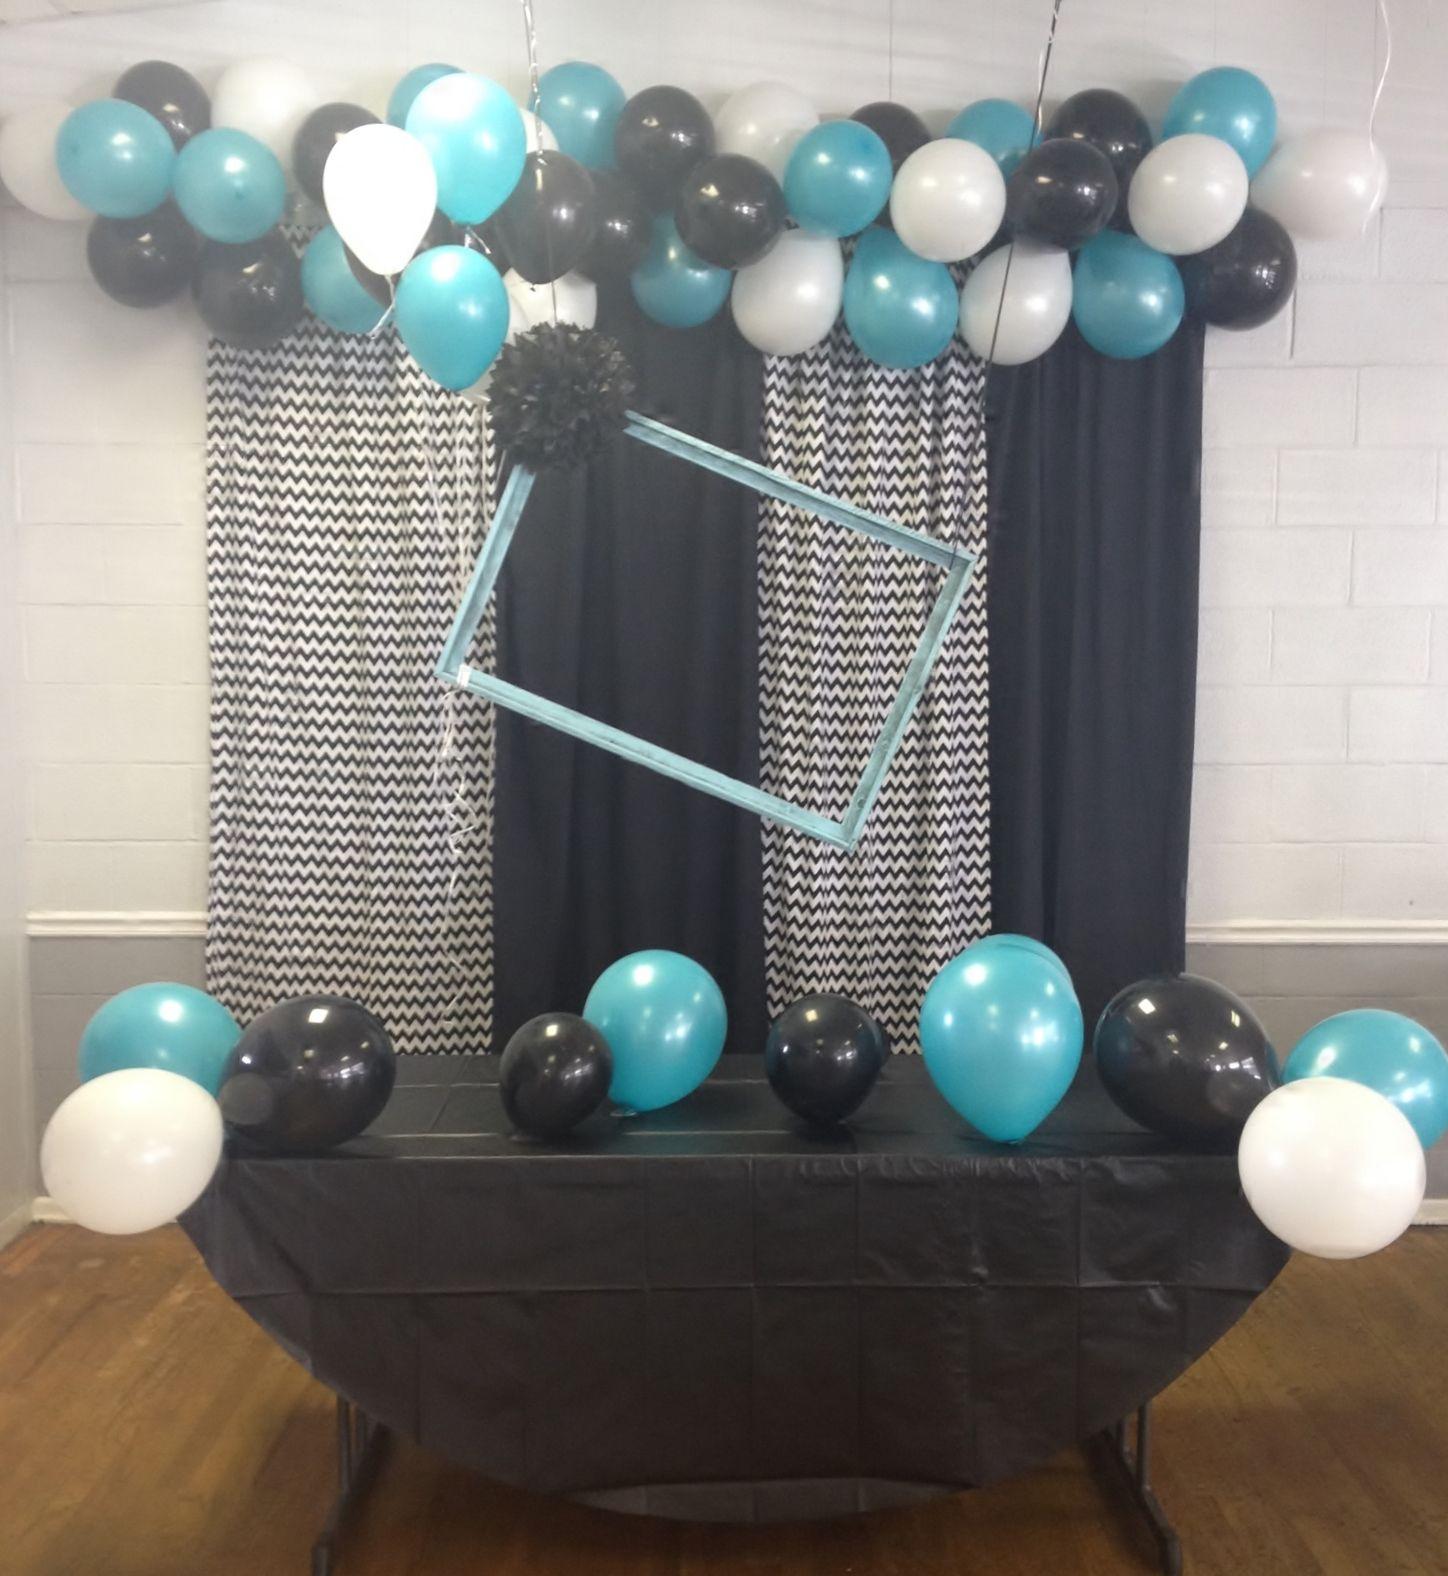 Tiffany Themed Party For Keira S 18th Birthday: Pinterest (Canada